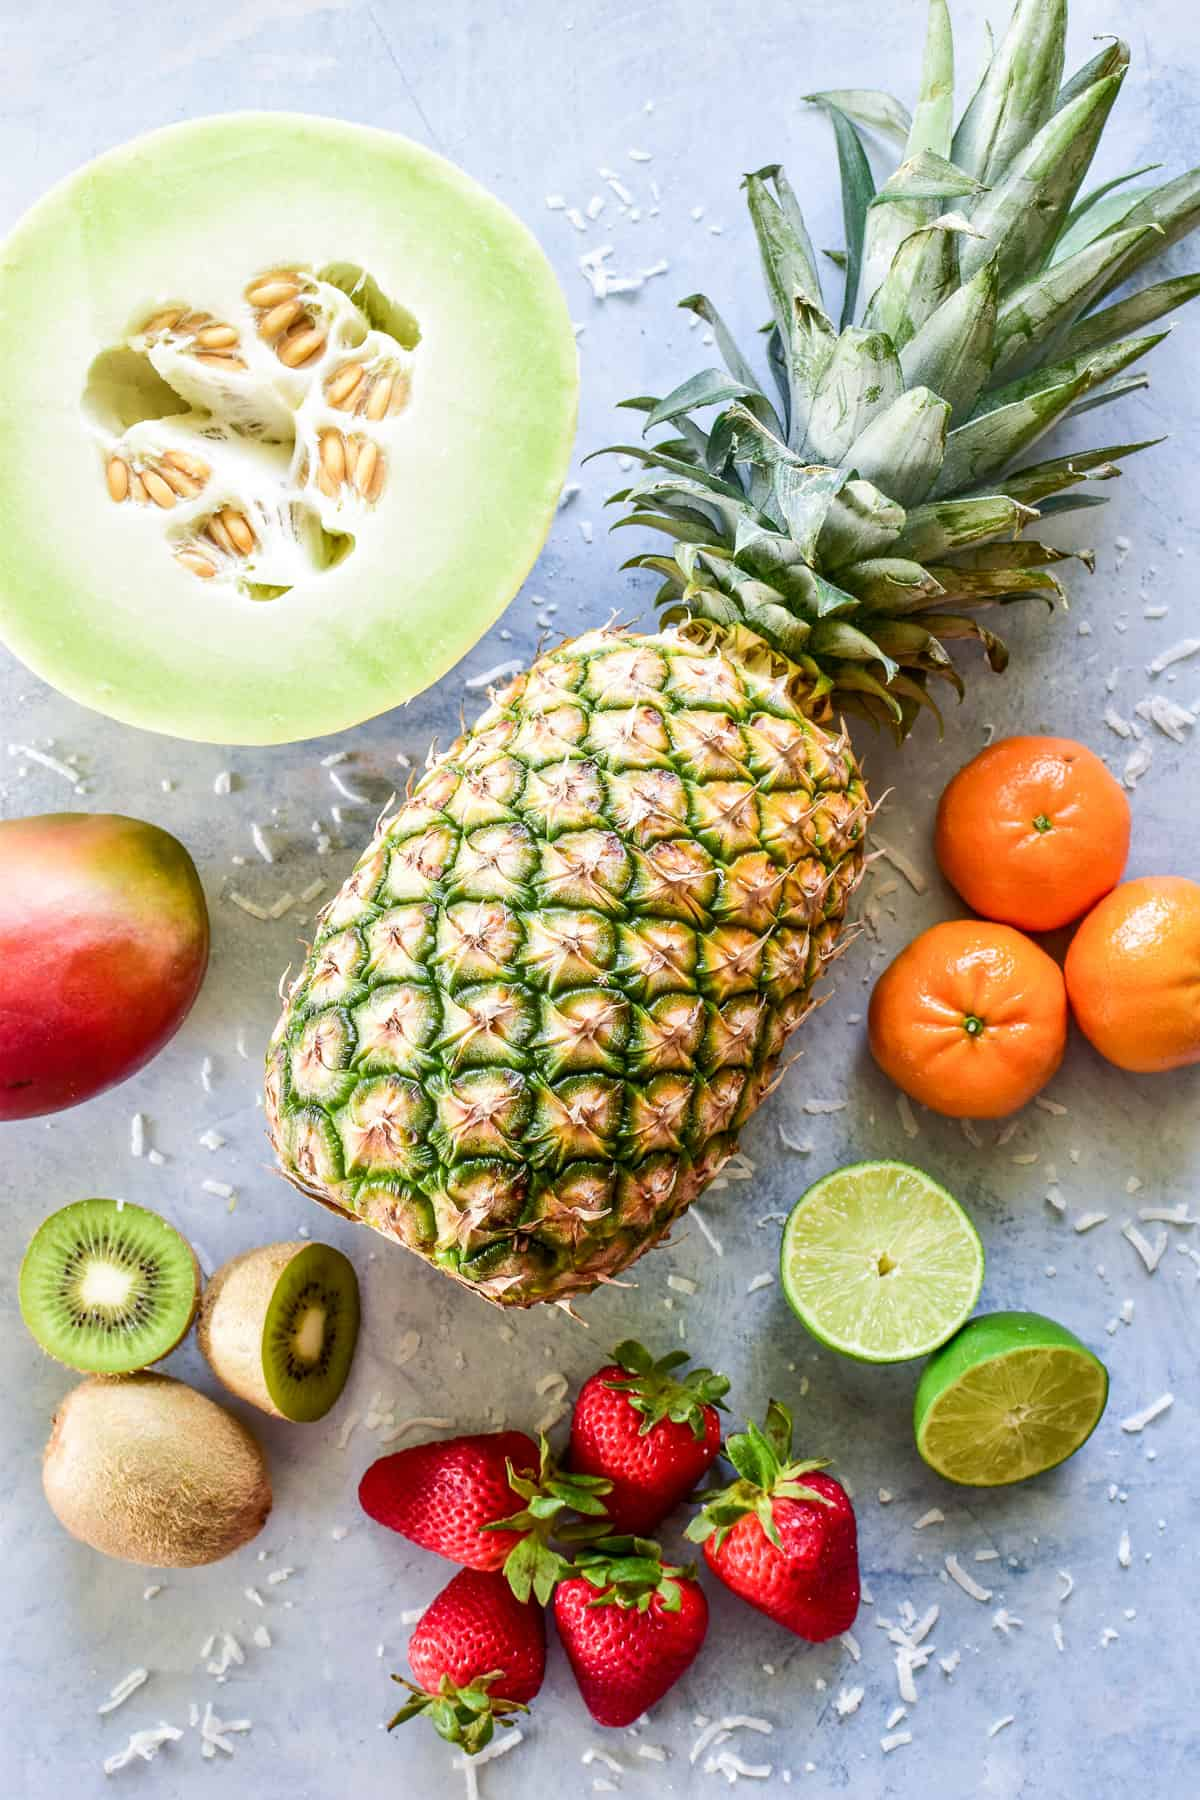 Tropical Fruit Salad ingredients